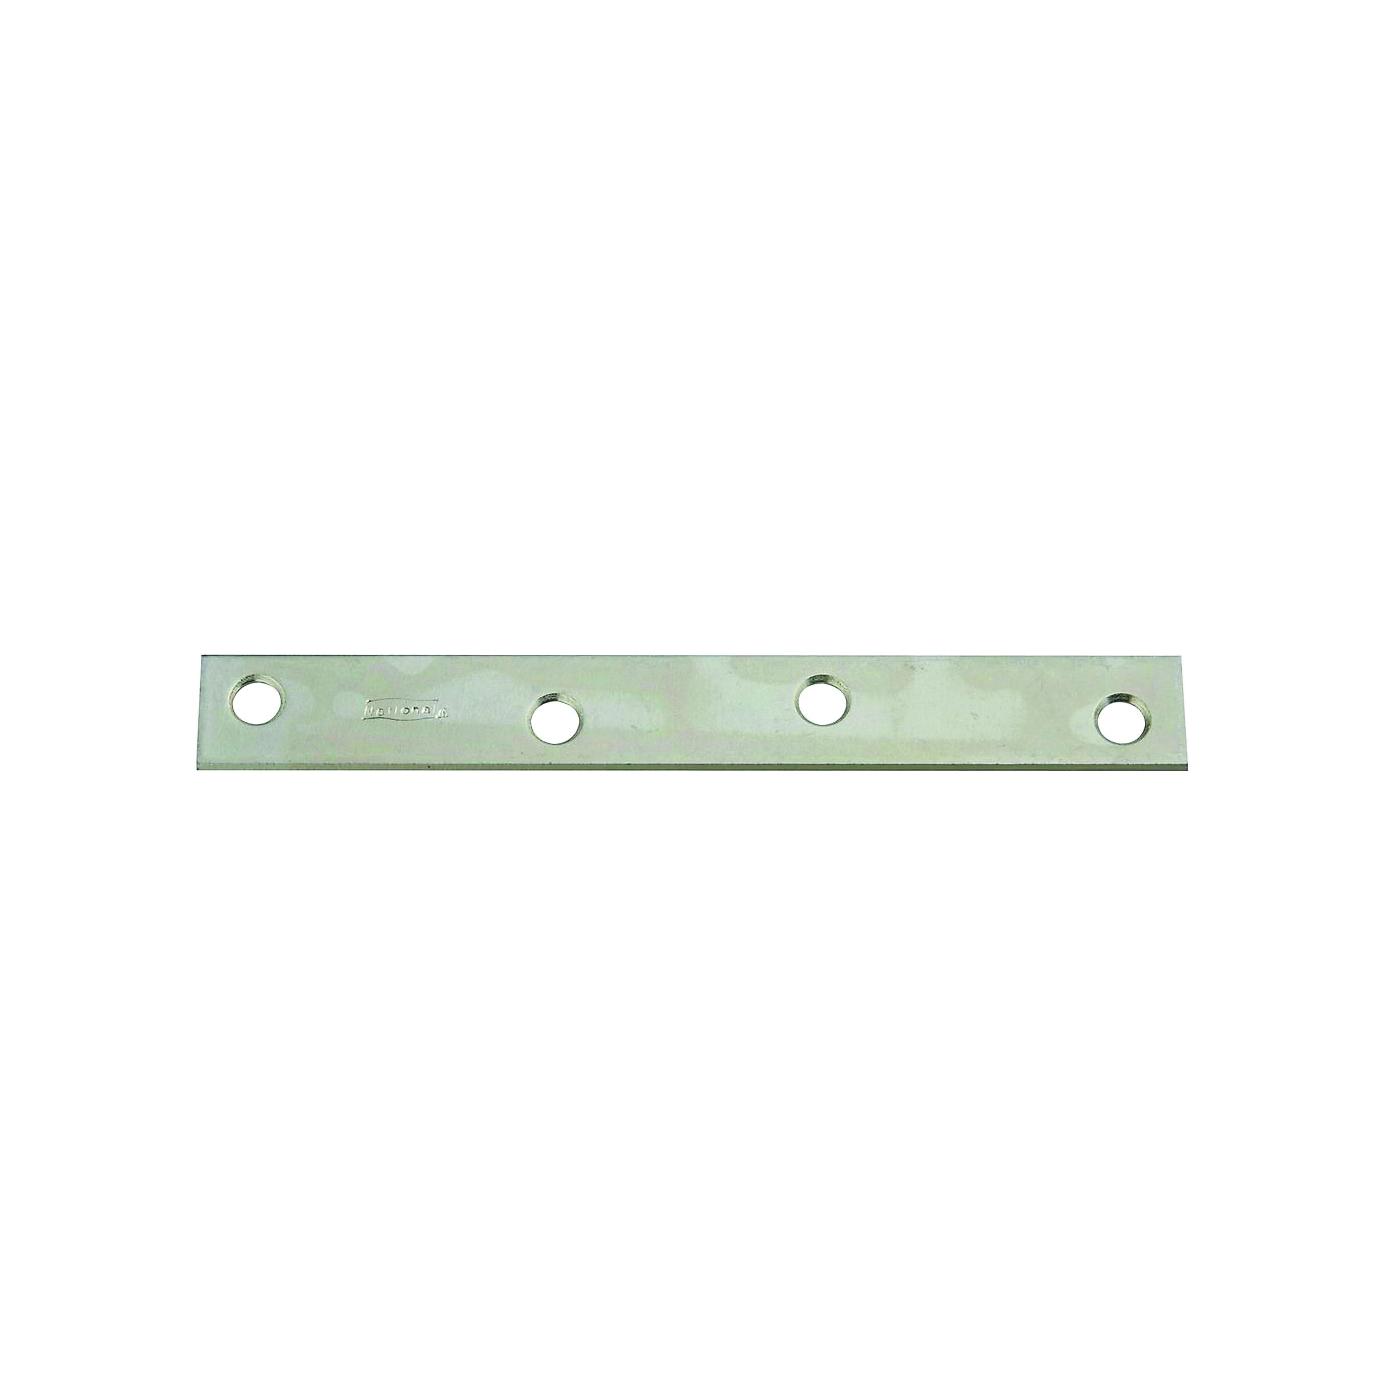 Picture of National Hardware 220285 Mending Brace, 6 in L, 3/4 in W, Steel, Zinc, Screw Mounting